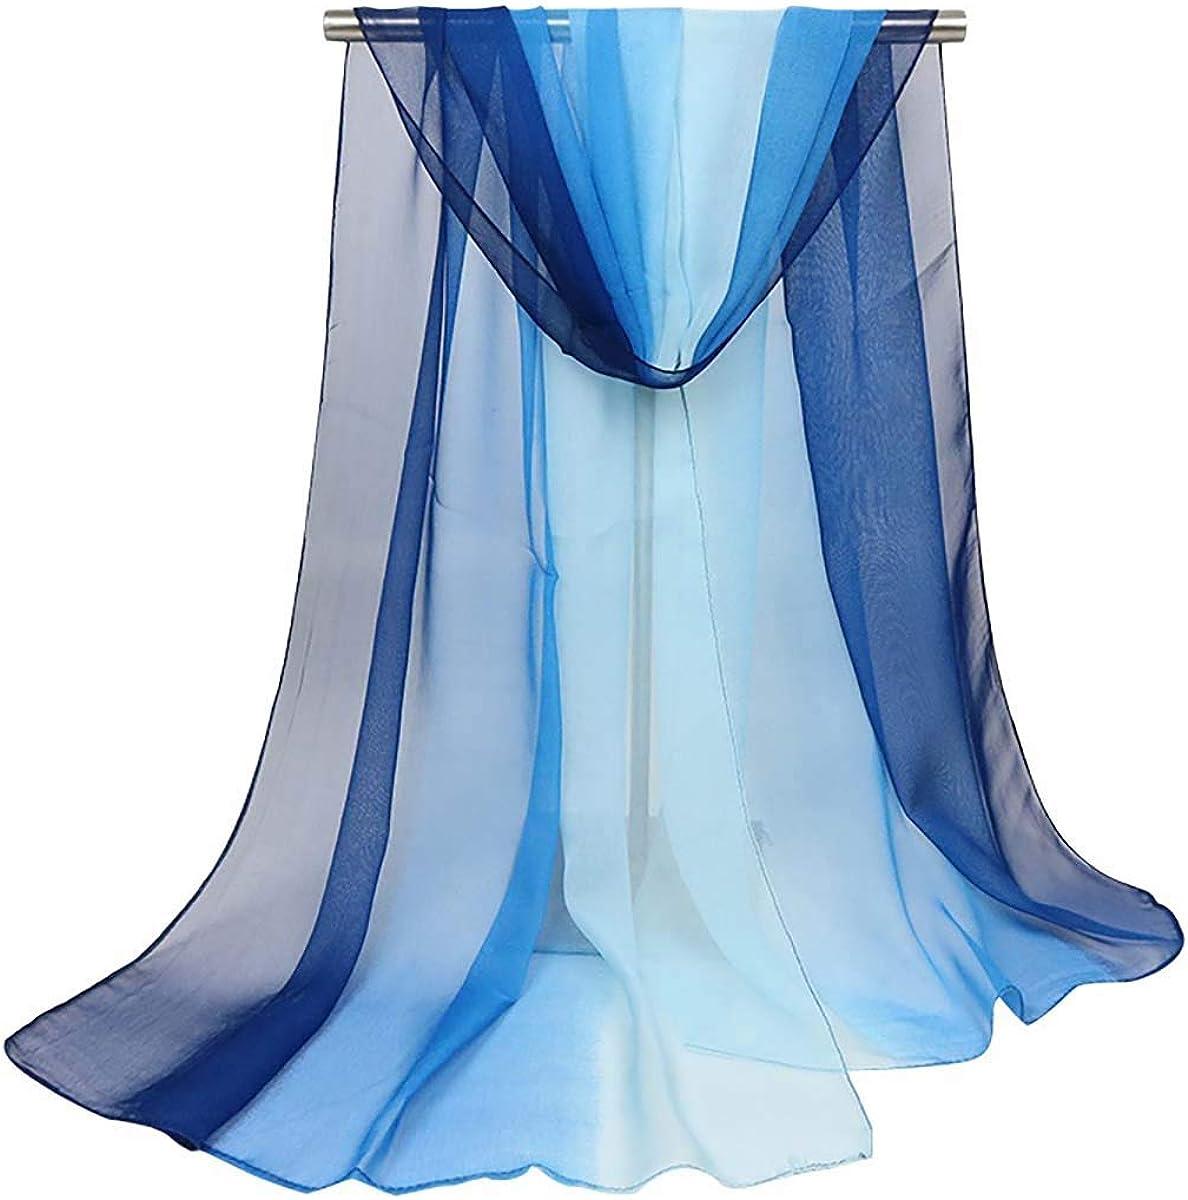 Acotavie Women's Scarf Fashion Pattern Long Lightweight Sunscreen Shawls Scarves